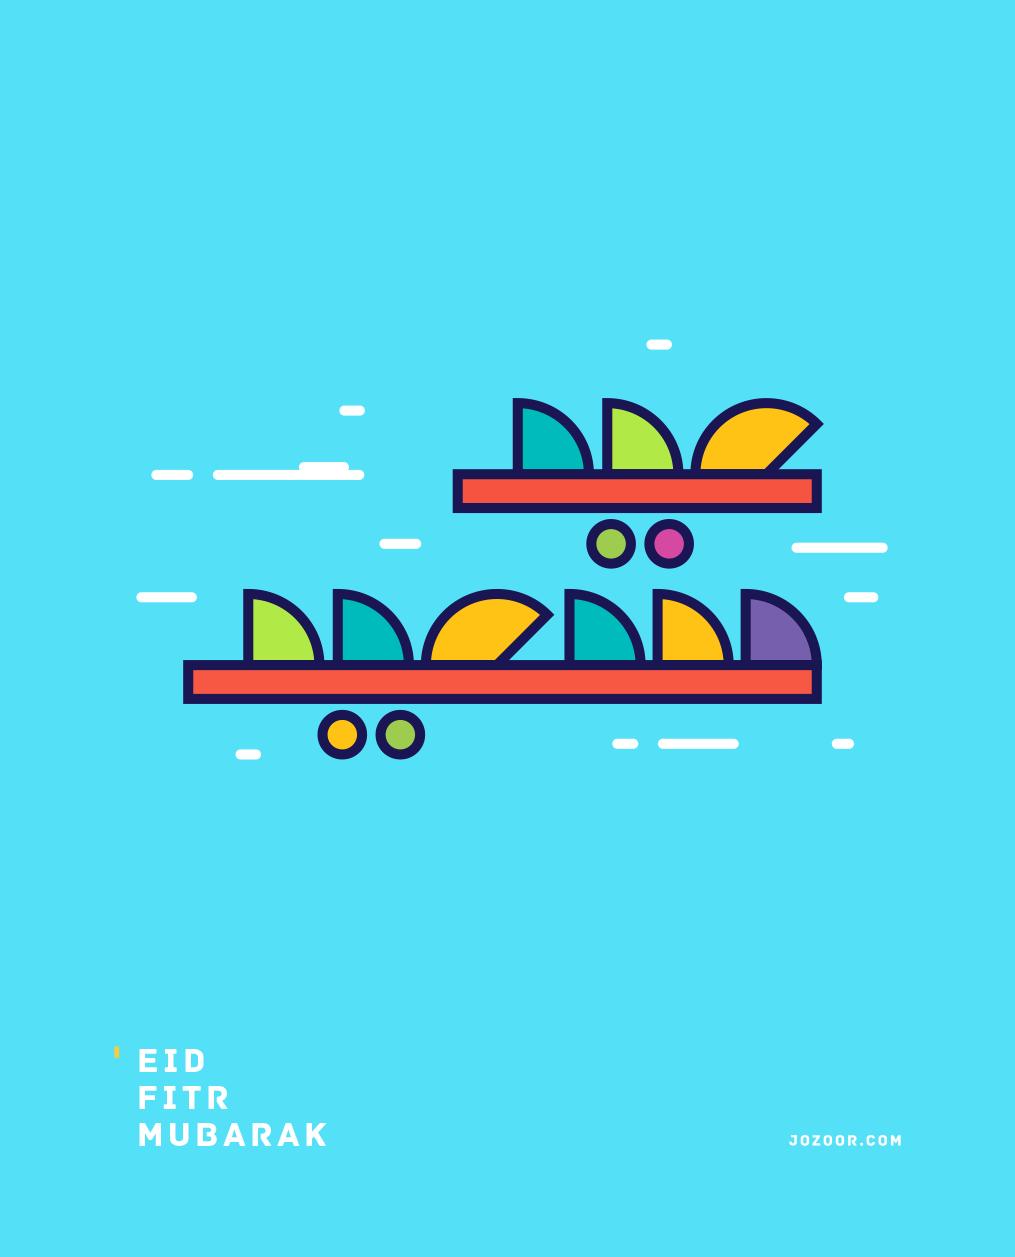 Eid Fitr Mubarak On Behance Illustration Design Pinterest Eid